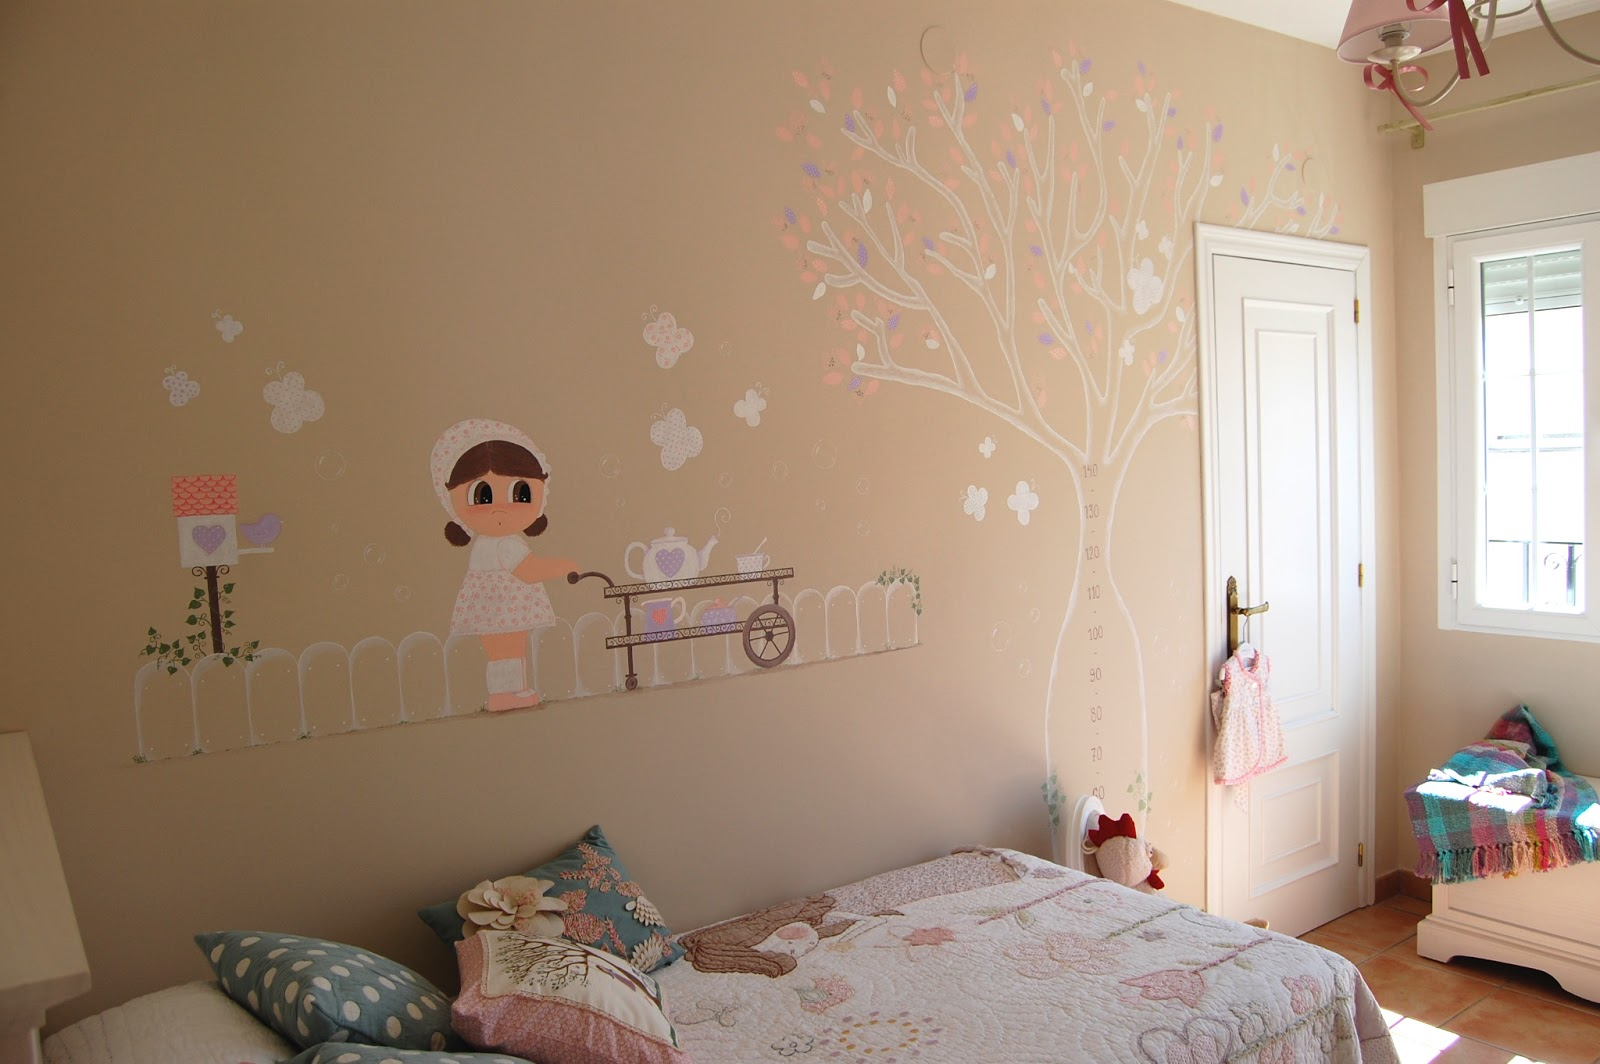 Coconic Decoraci N Infantil Personalizada Murales ~ Pintura Para Habitaciones Infantiles